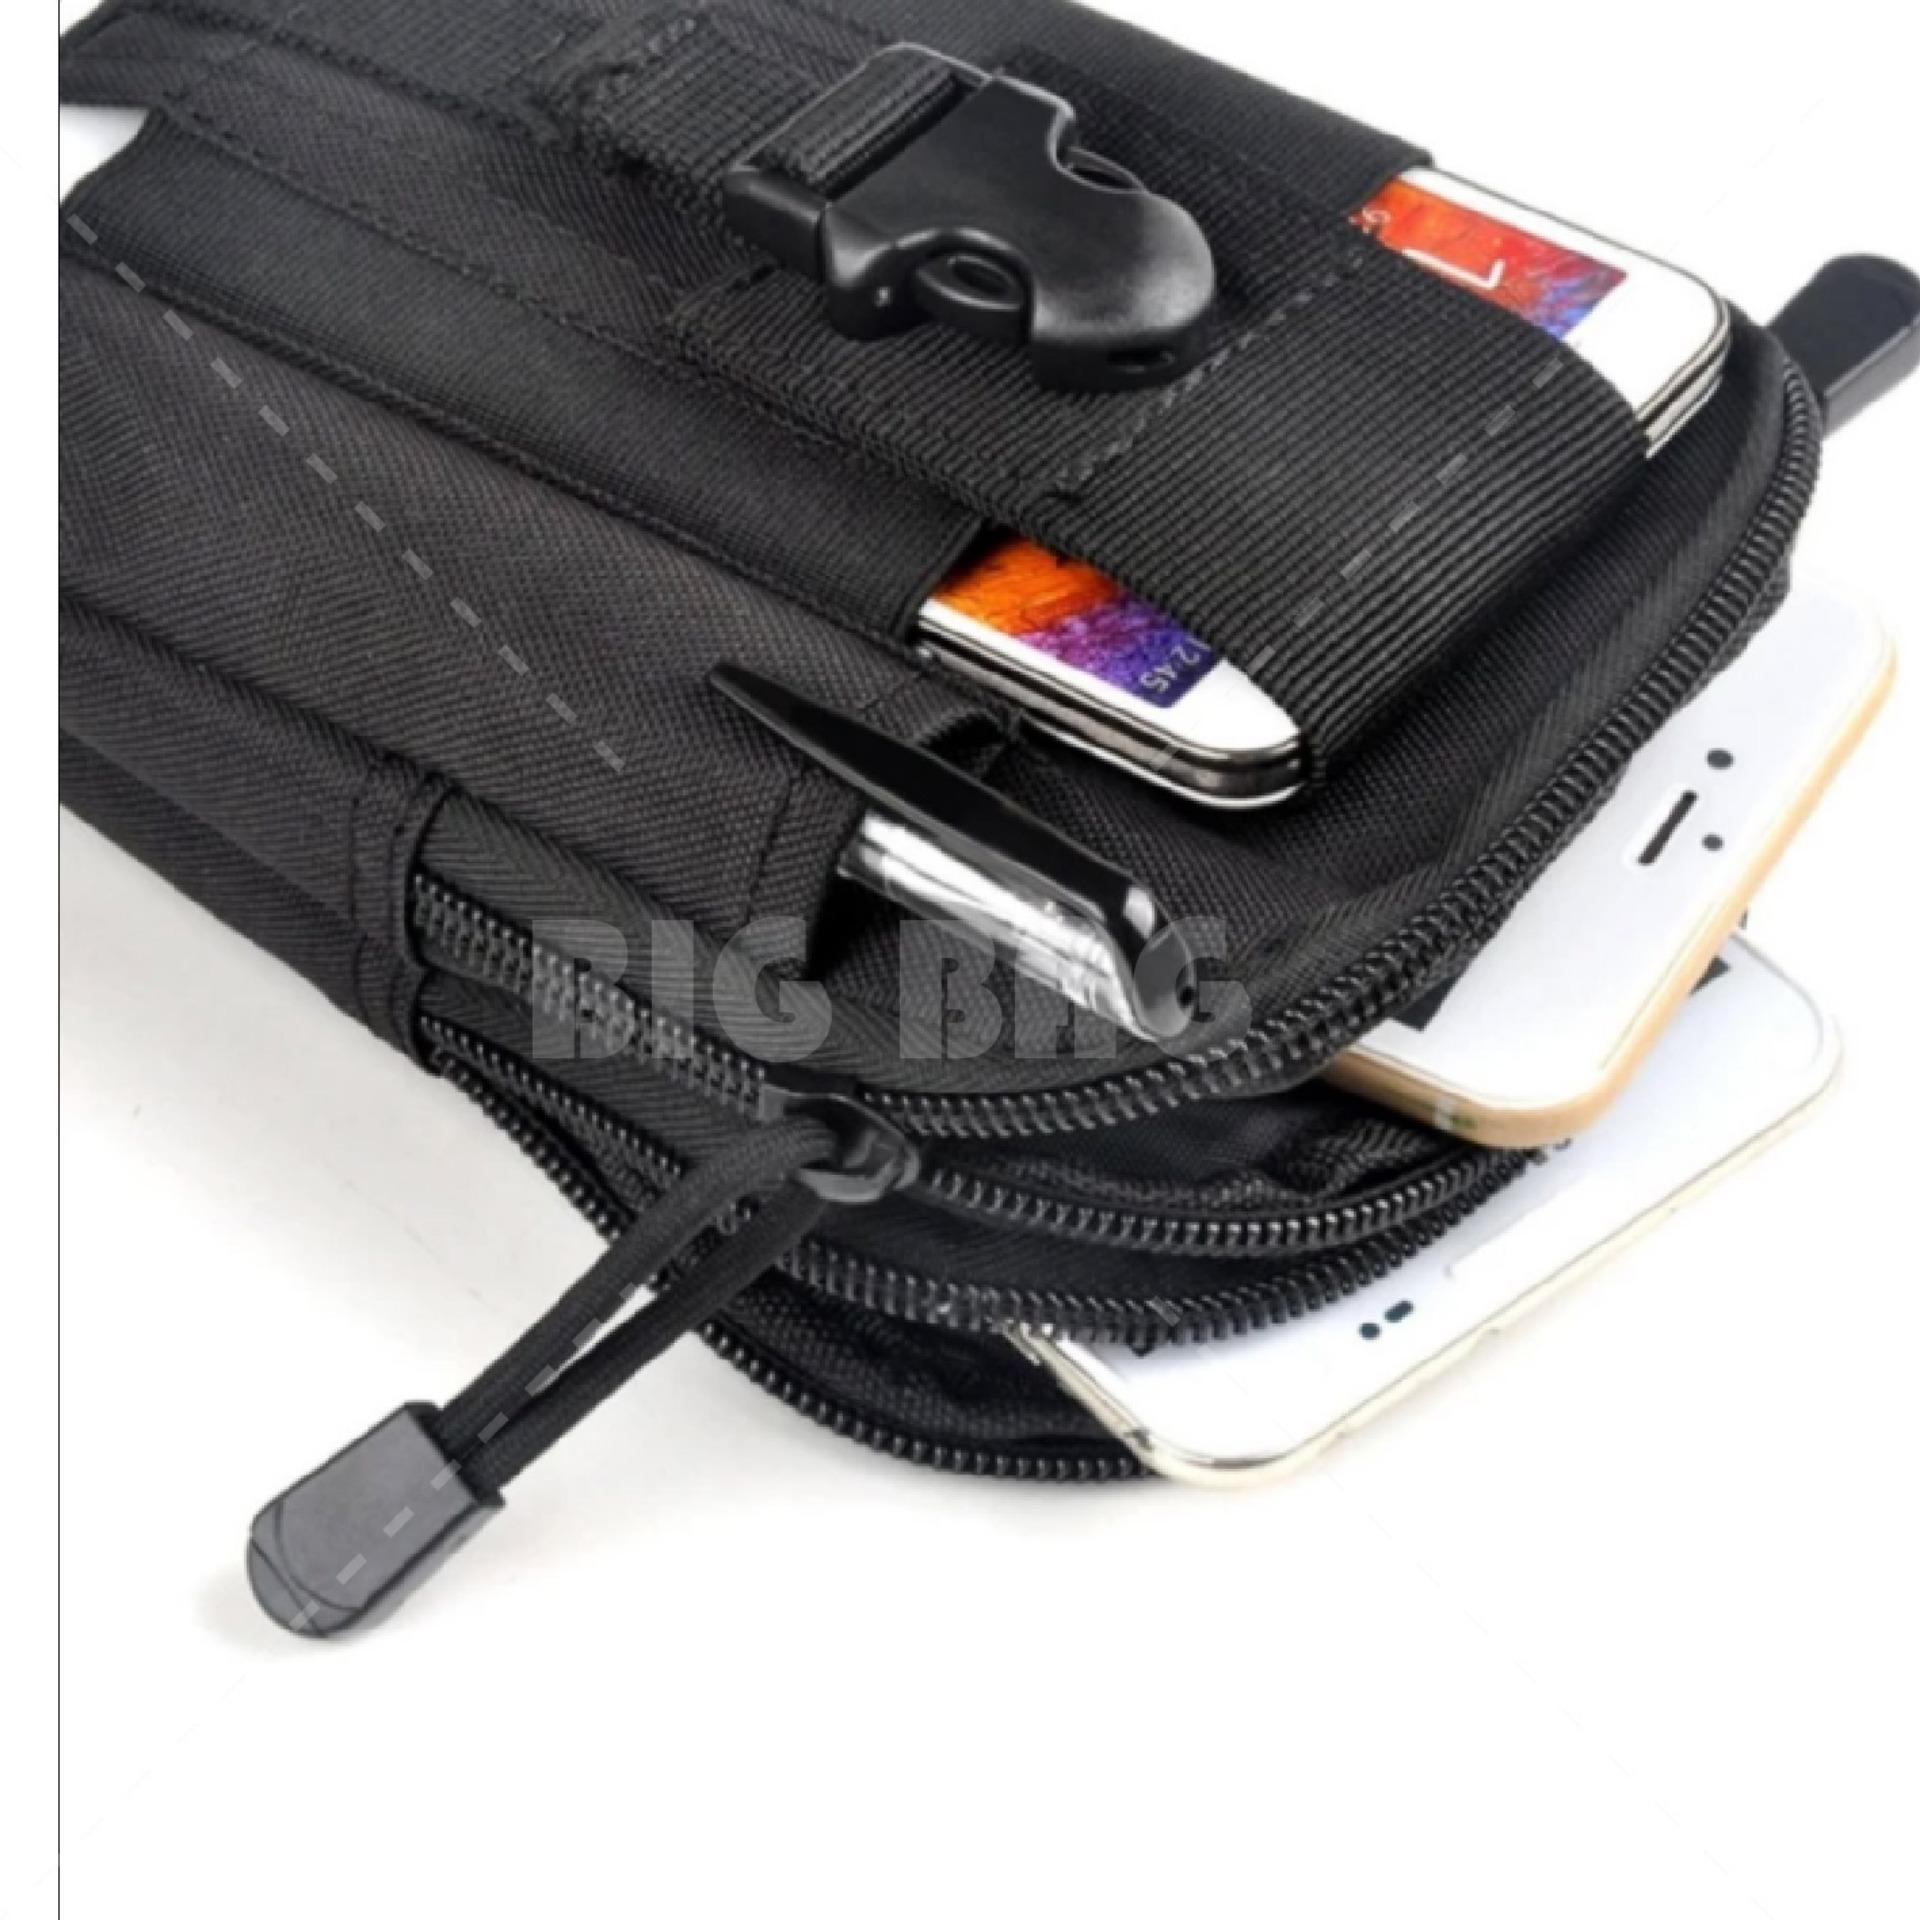 Tas Pinggang Pria Army Tactical Molle Waist Small Bag Military 1 Gratis Outdoor Cowok Militer Import Hitam